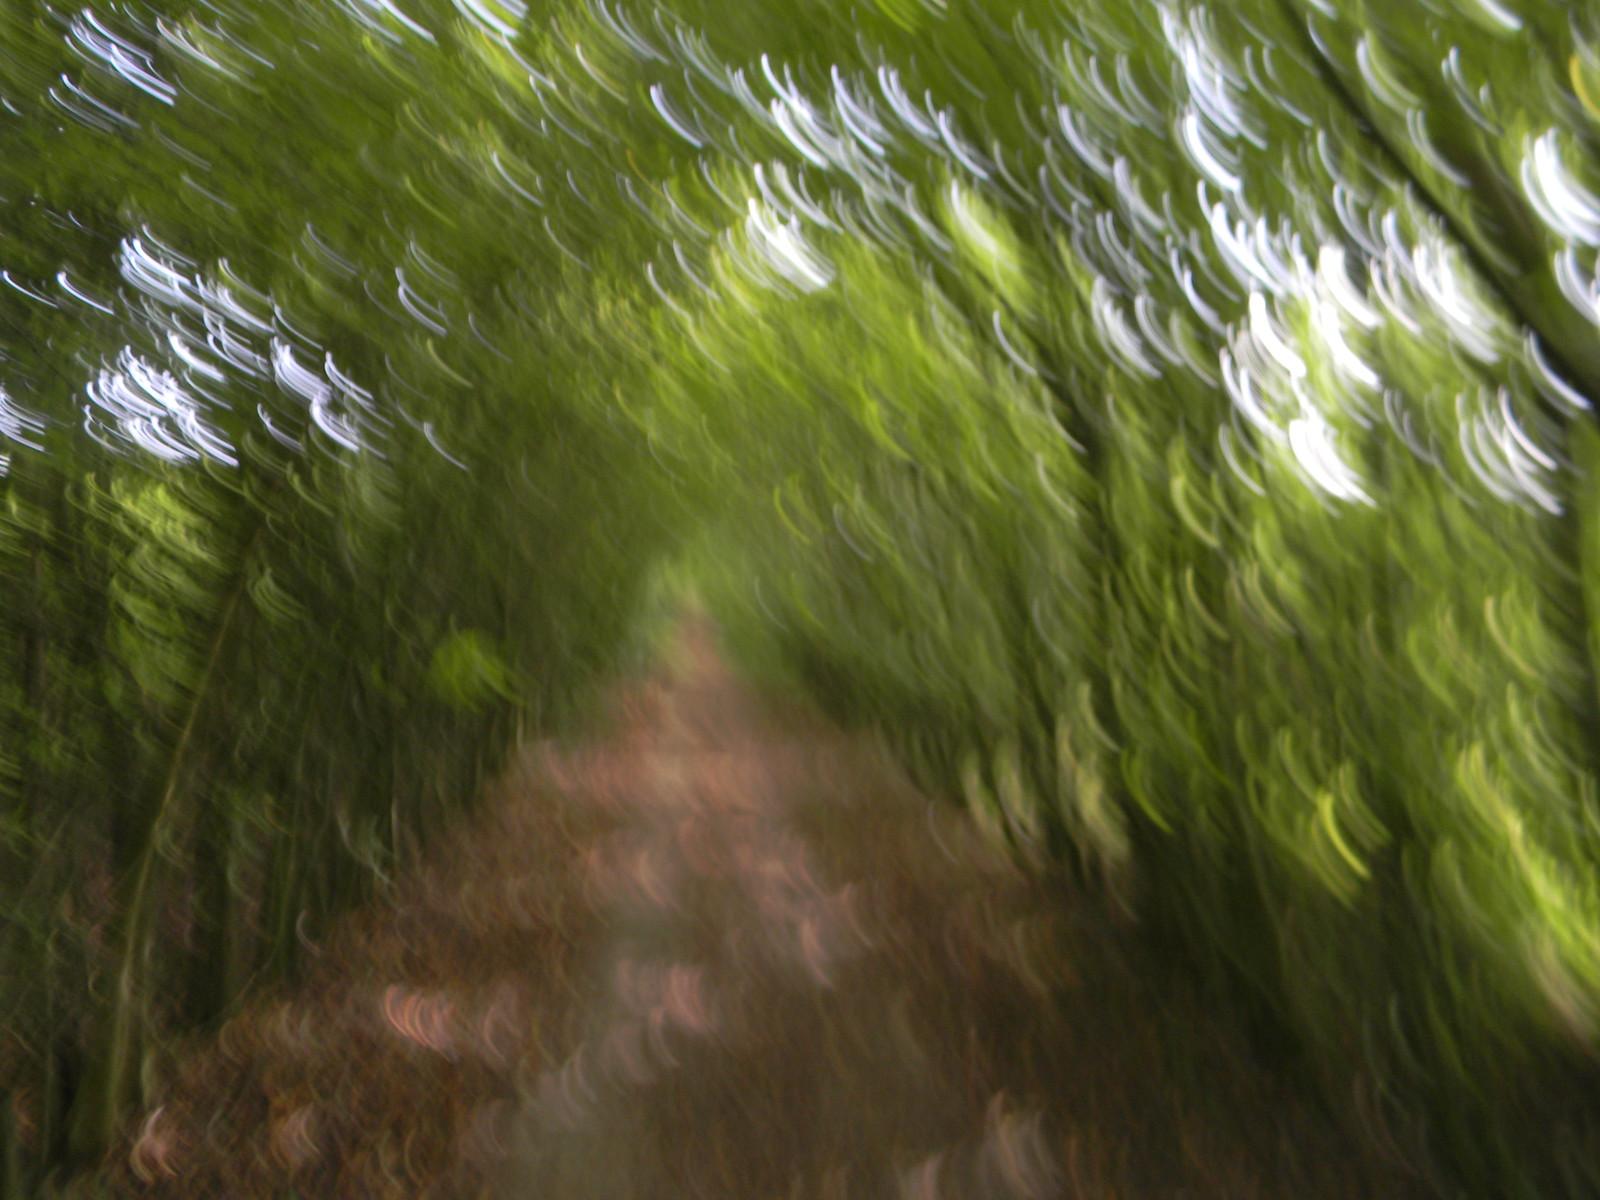 Treelined 'tunnel' Eynsford Circular